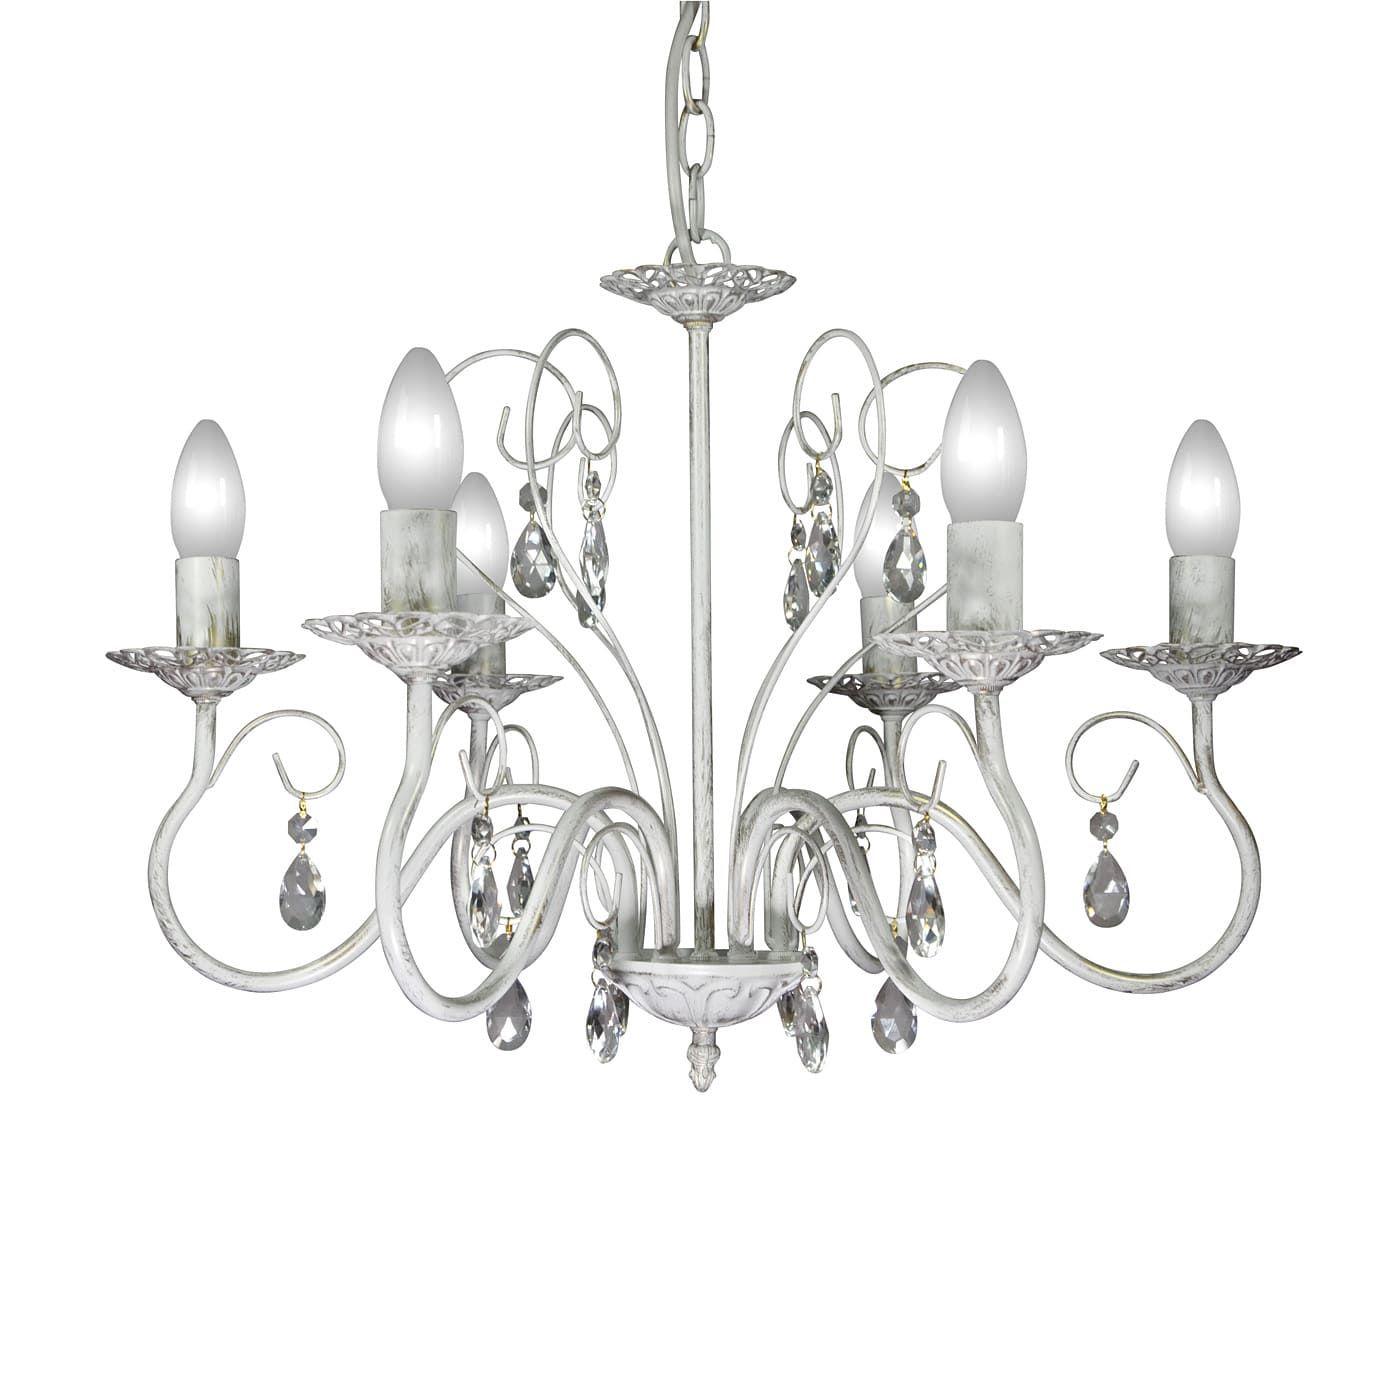 PETRASVET / Pendant chandelier S1163-6, 6xE14 max. 60W